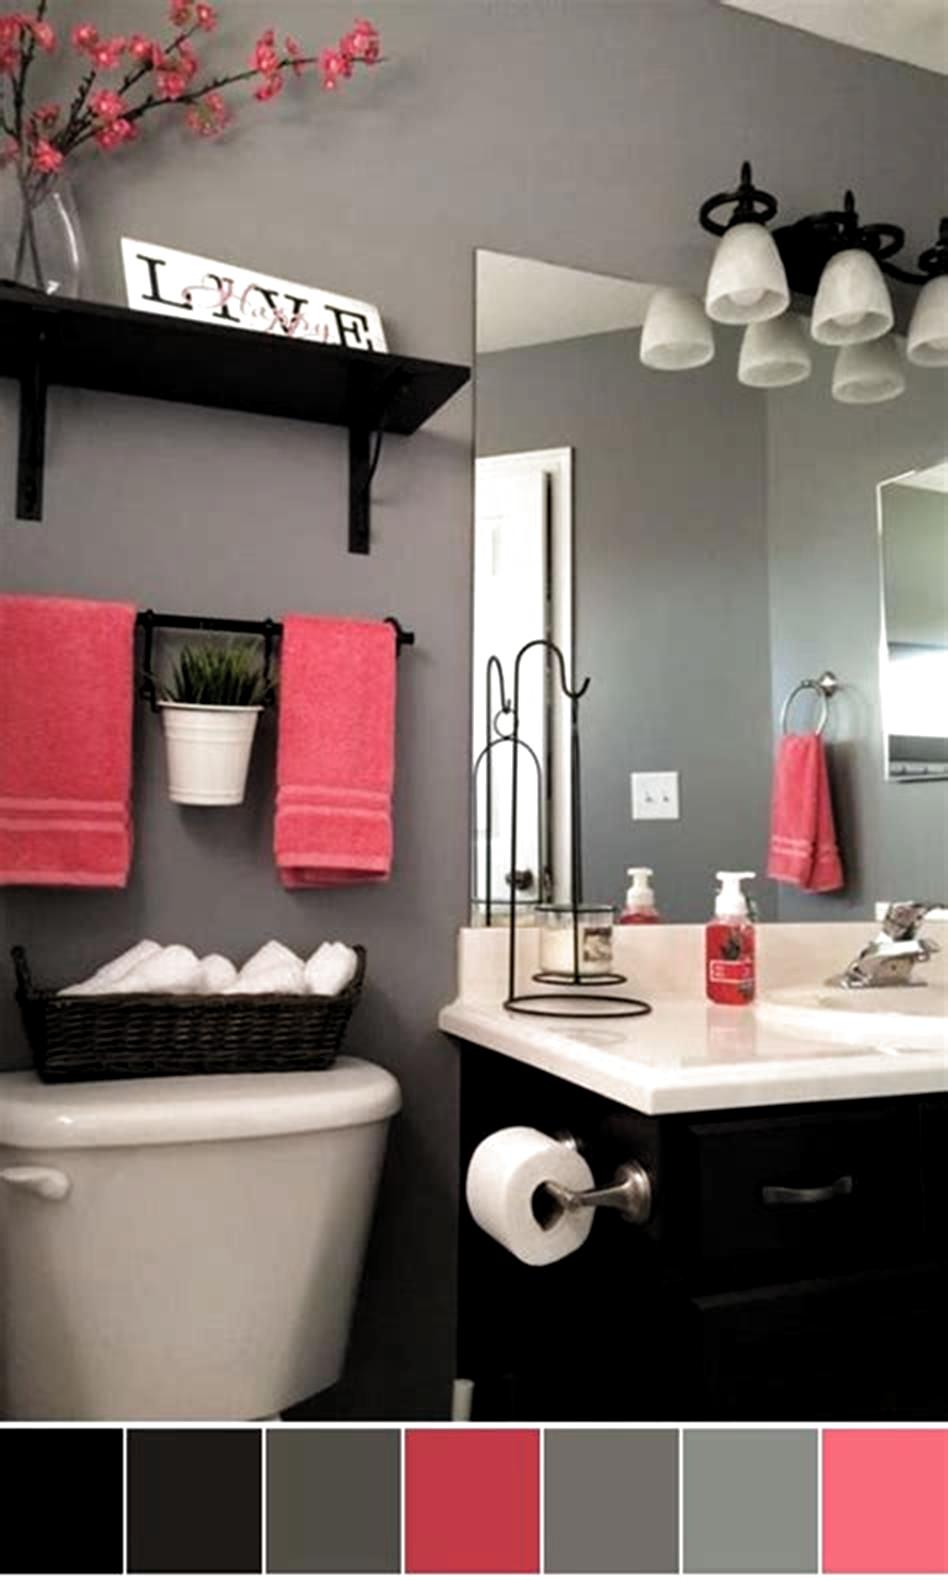 40 Best Color Schemes Bathroom Decorating Ideas On A Budget 2019 30 In 2020 Bathroom Color Schemes Gray Bathroom Decor Best Bathroom Colors